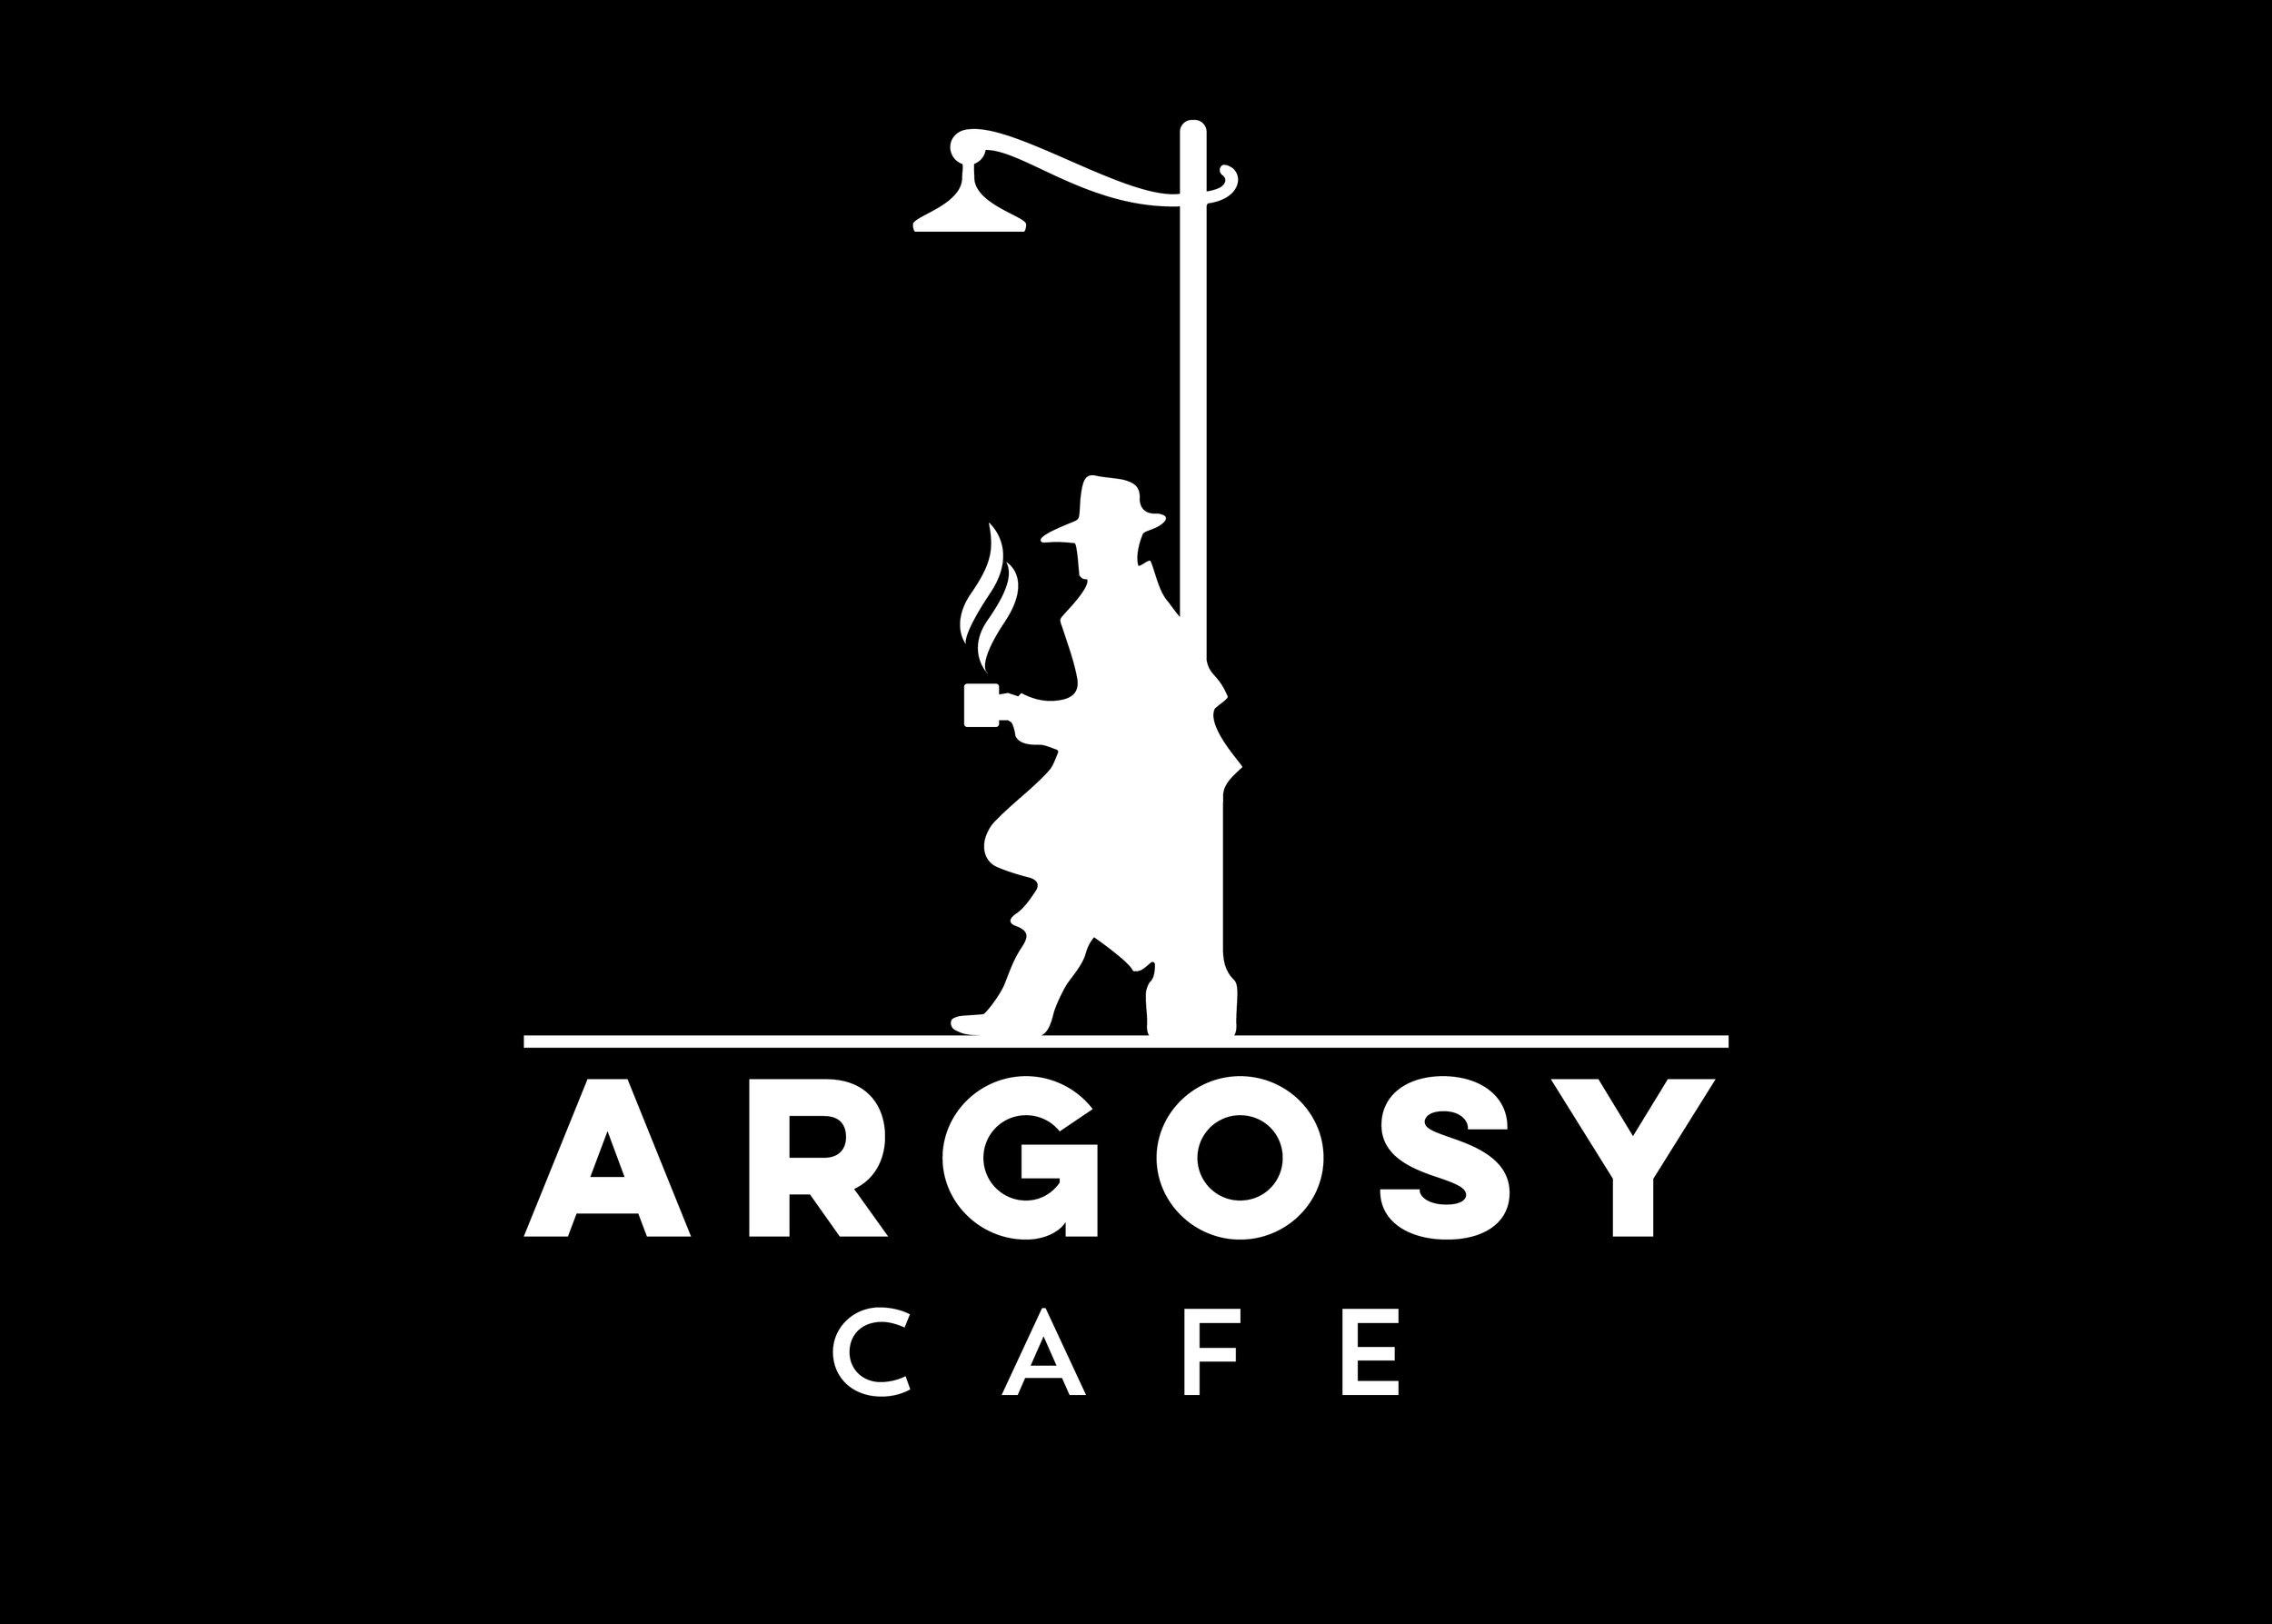 Argosy Cafe